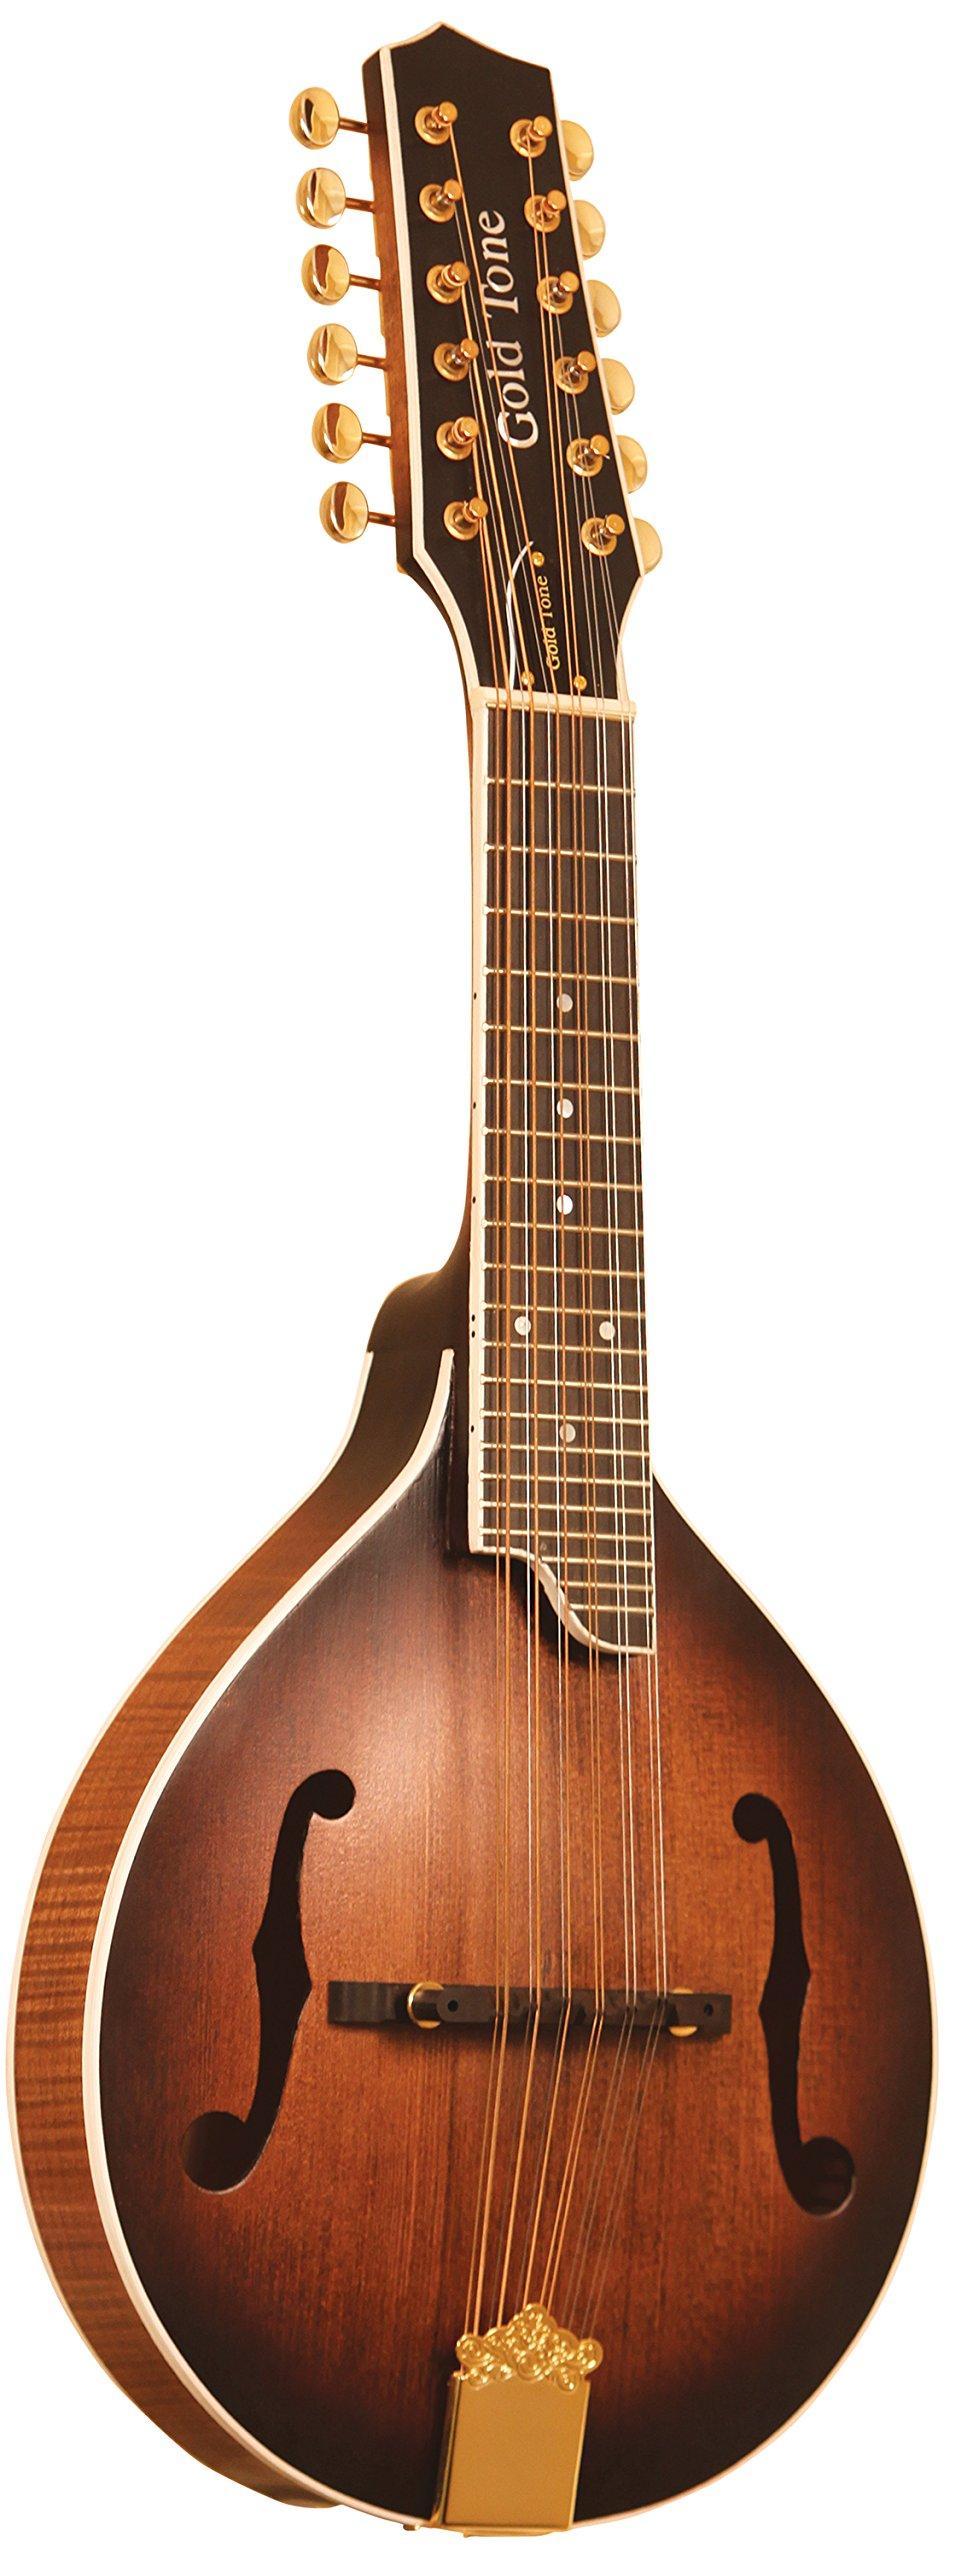 Gold Tone GM-12+ 12-String Guitar Mandolin with Pickup